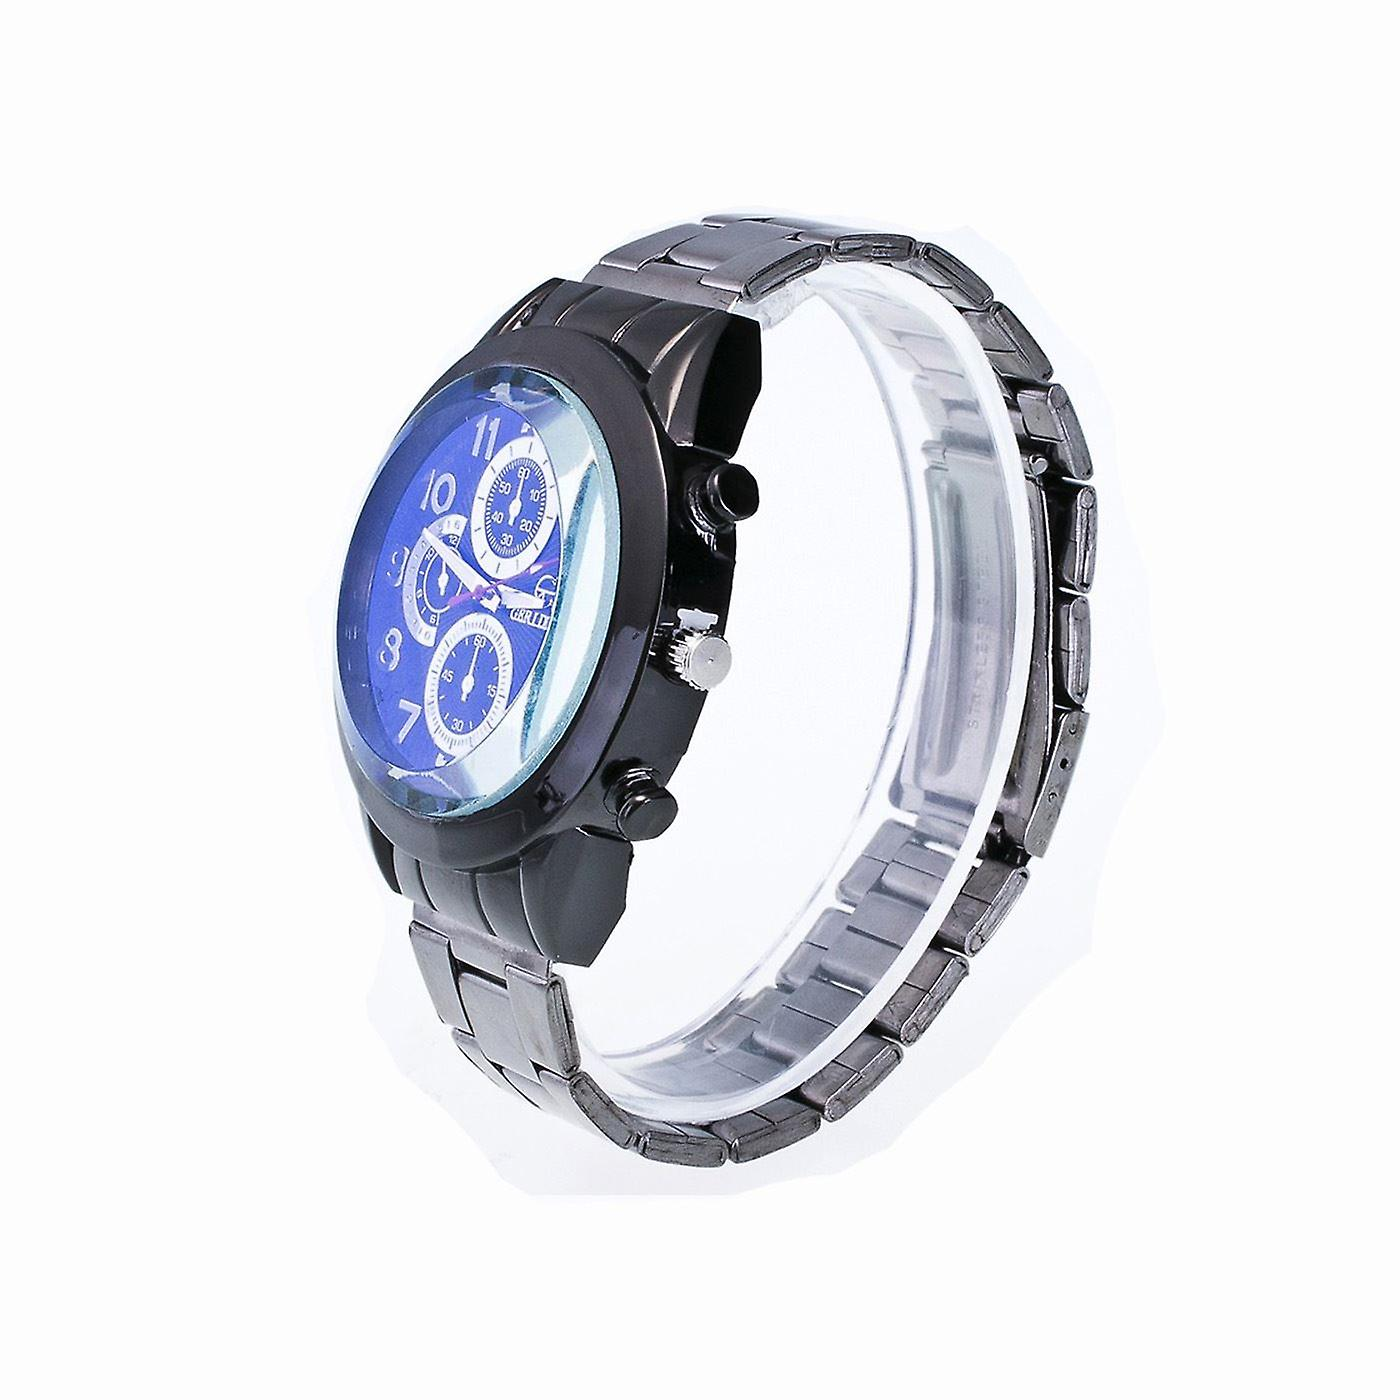 Smart BLUE Watch Mens Boys Gift Present Birthday Xmas TOP QUALITY UK SELLER